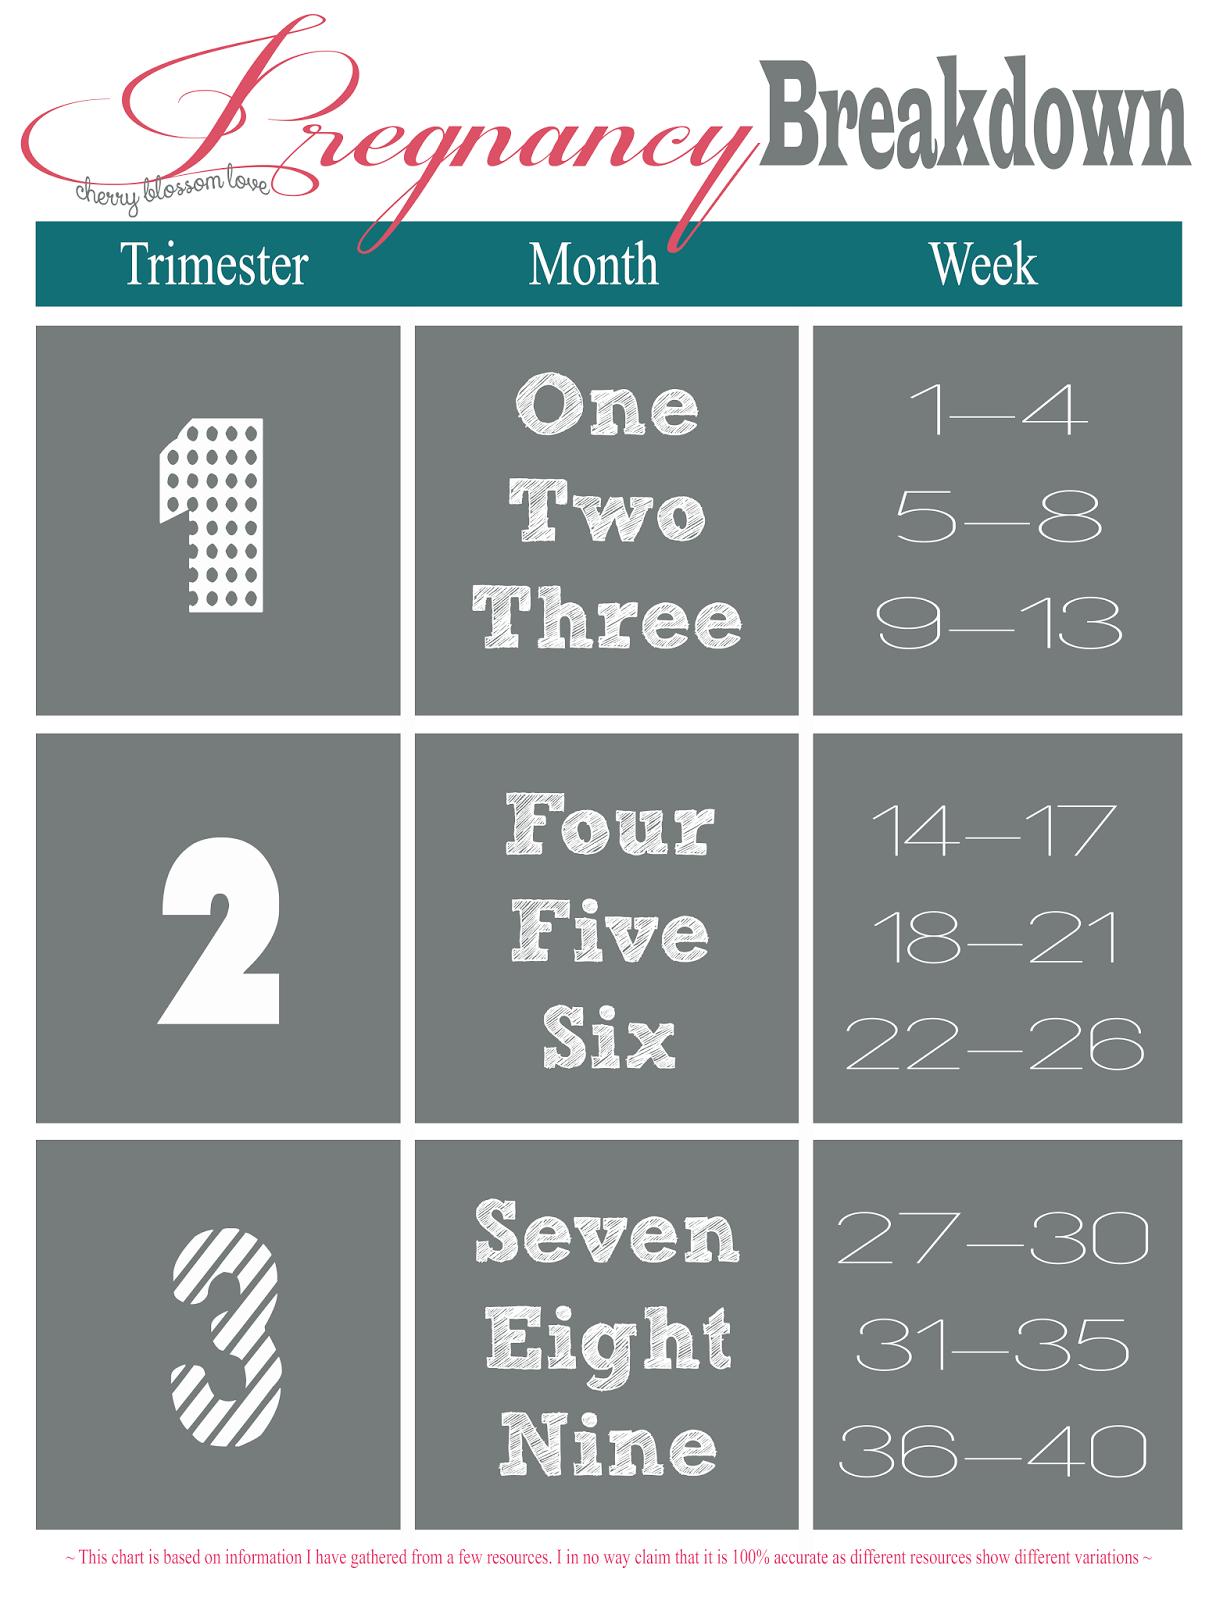 medium resolution of pregnancy breakdown in trimesters months and weeks